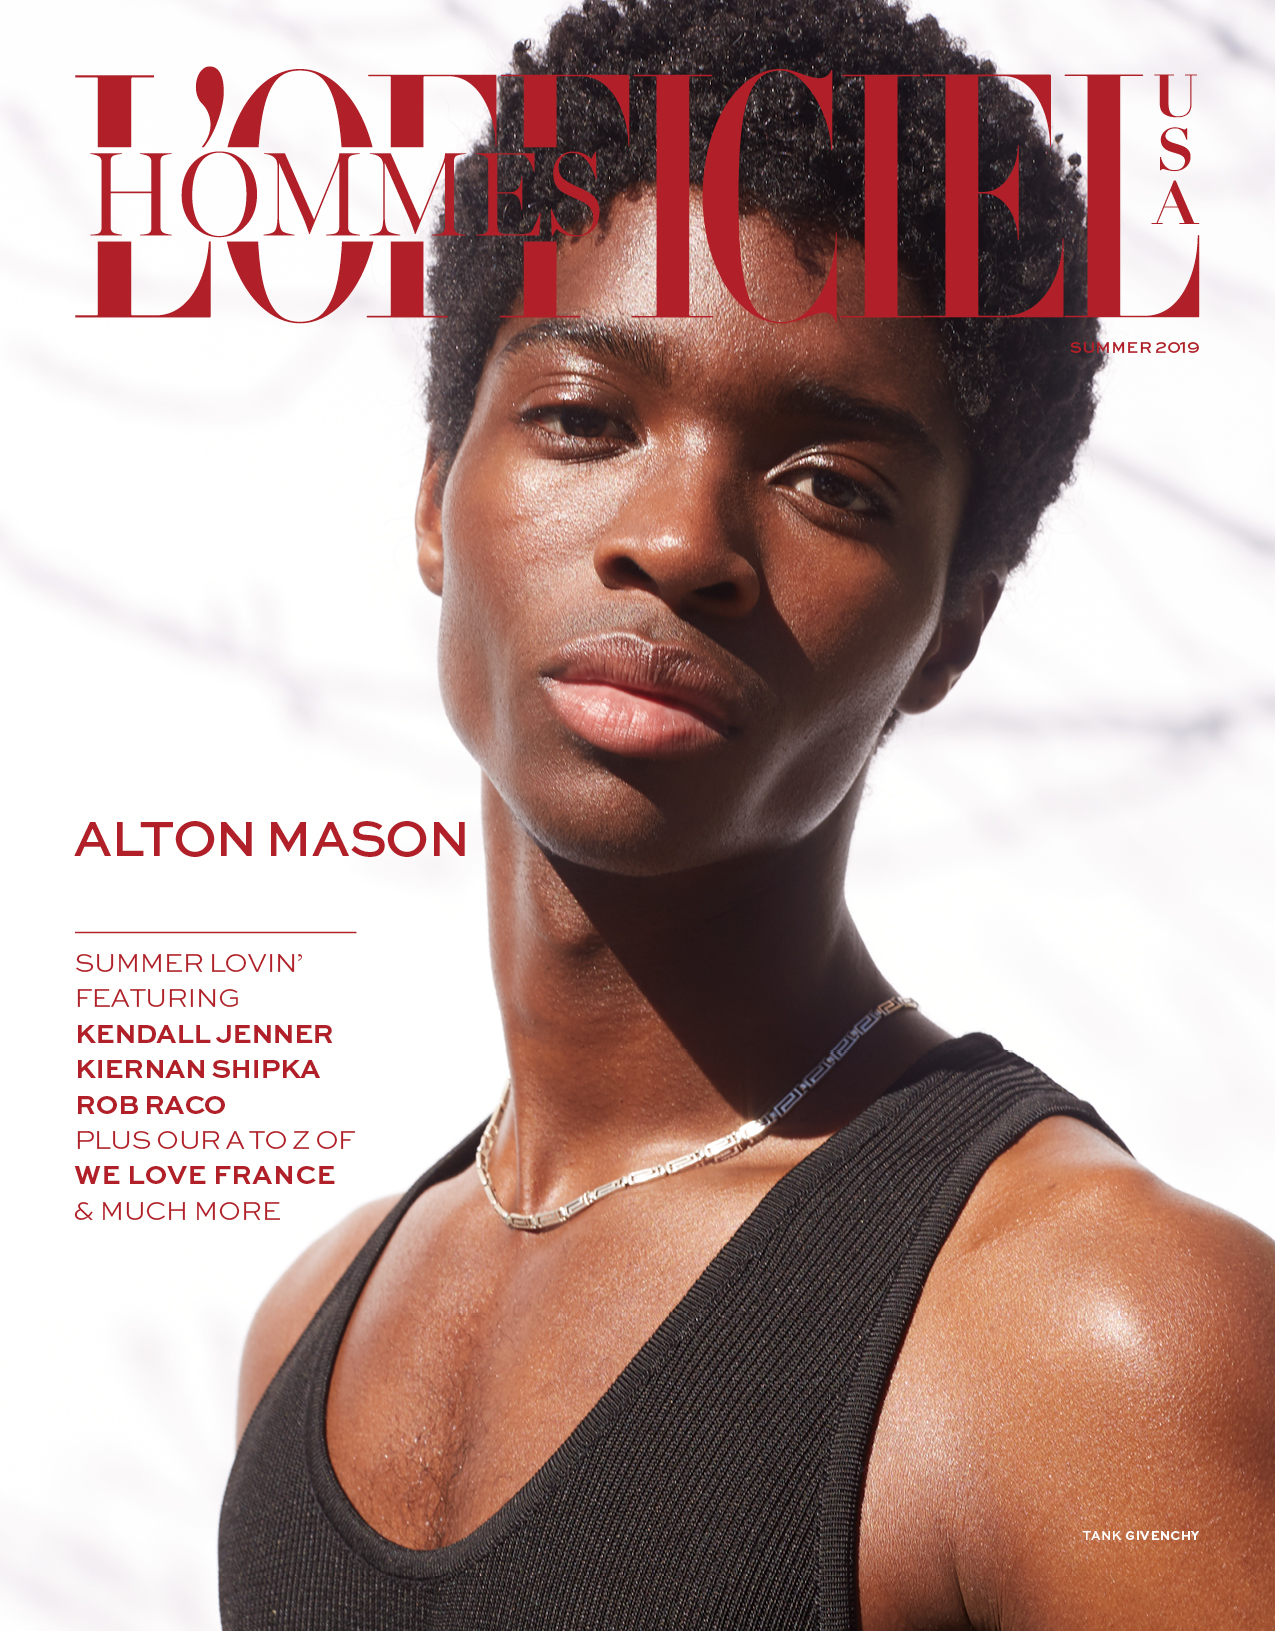 Alton Mason by Anthony Maule for L'Officiel USA